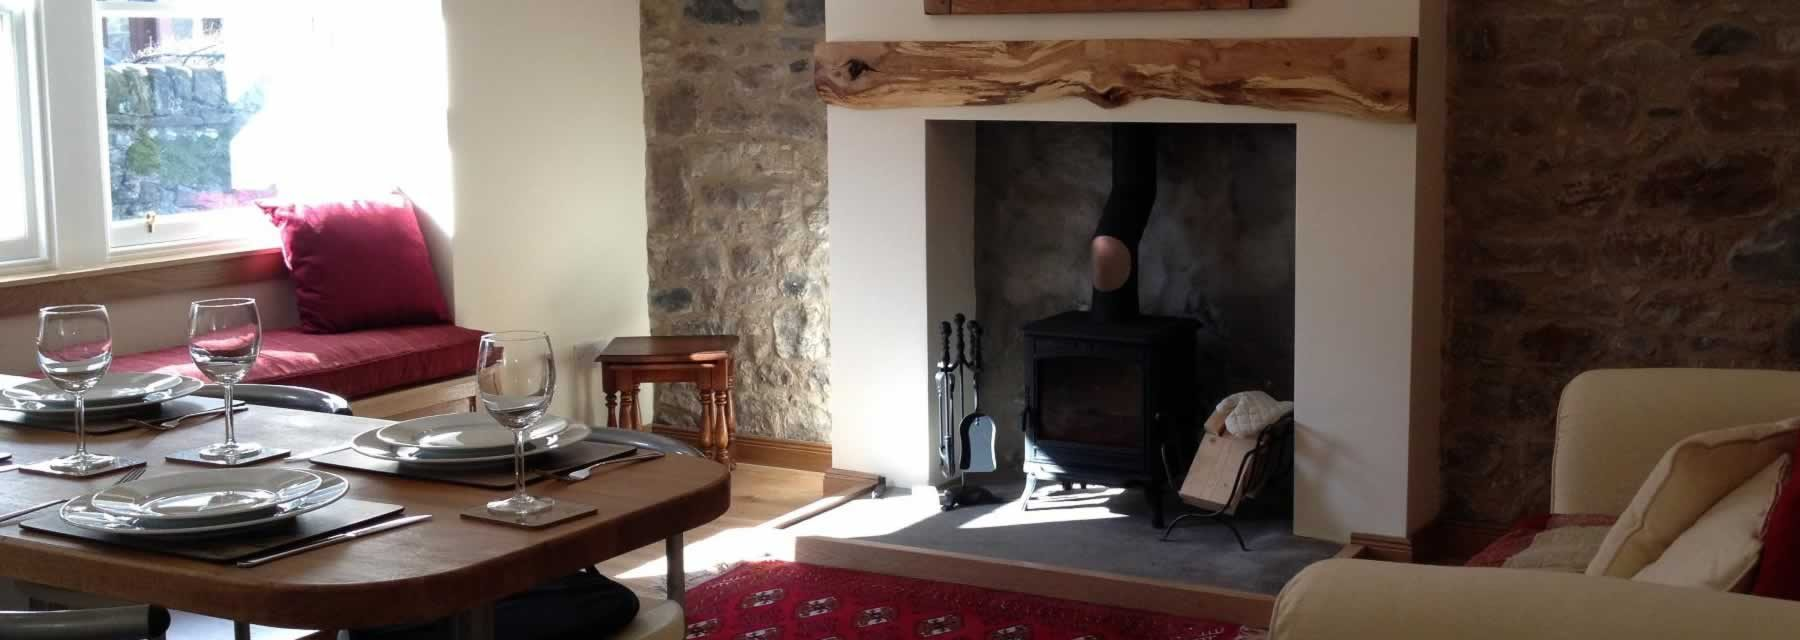 Gartmore interior holiday let property